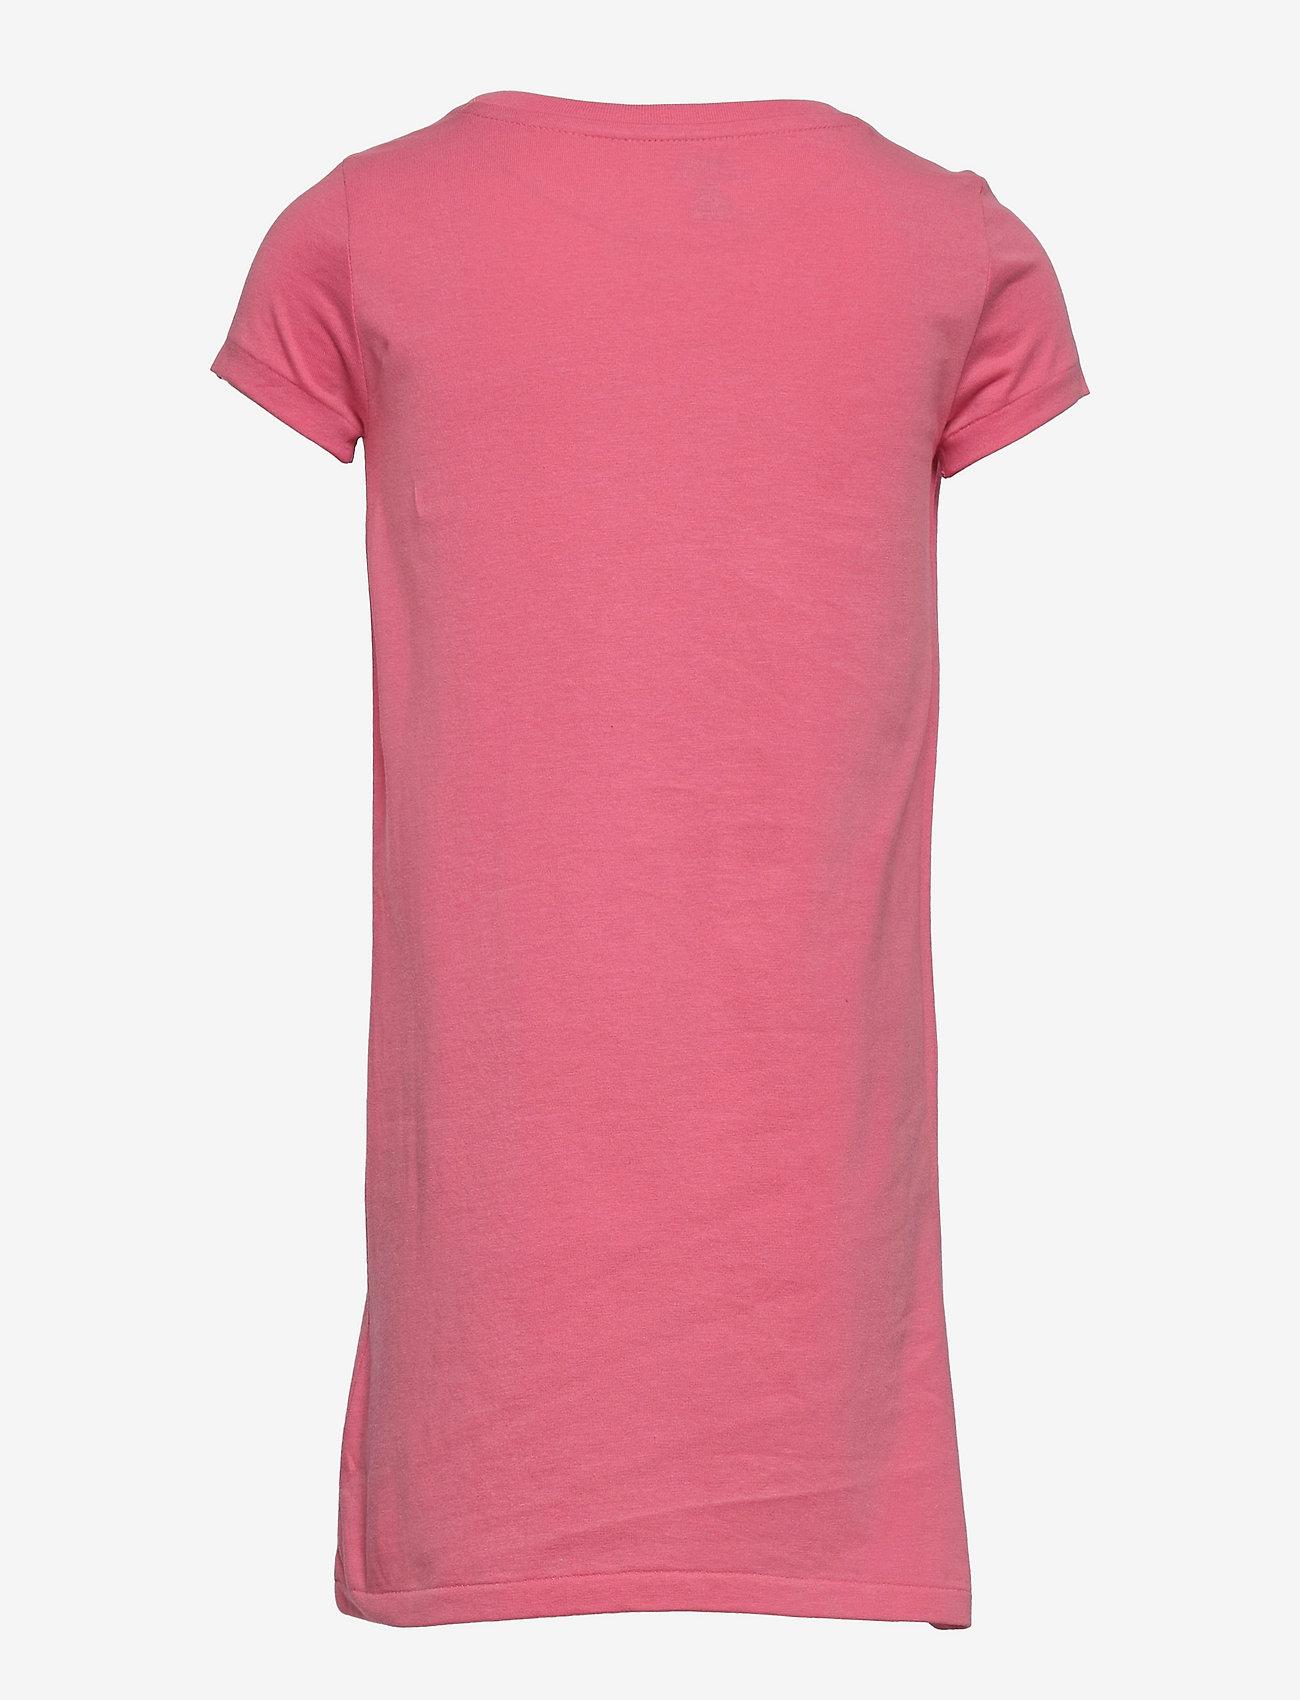 Ralph Lauren Kids - Big Pony Cotton Jersey Tee Dress - kleider - ribbon pink - 1